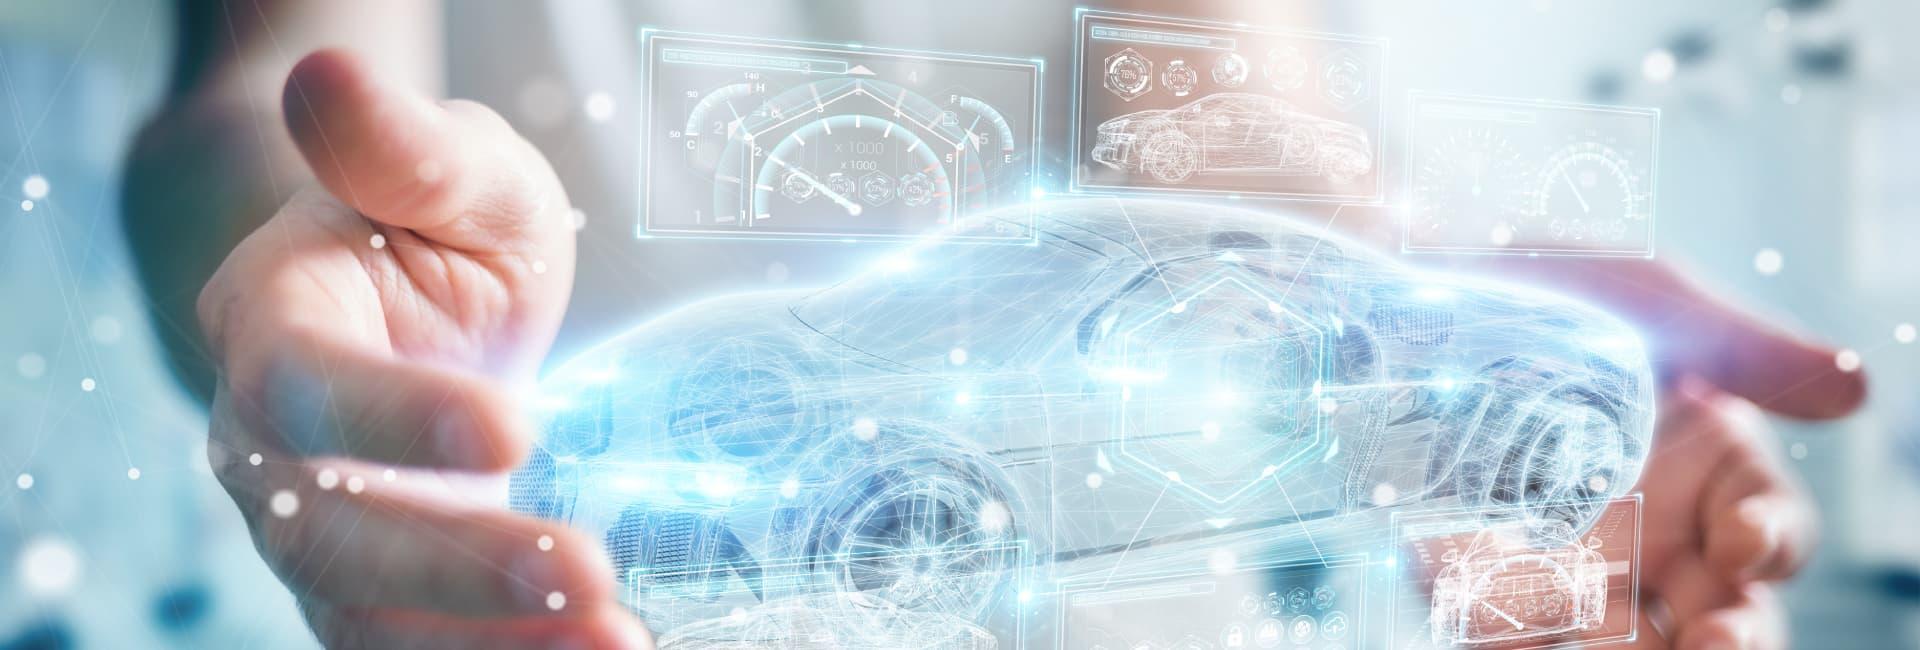 Promwad achieved ASPICE L2/L3 automotive certification